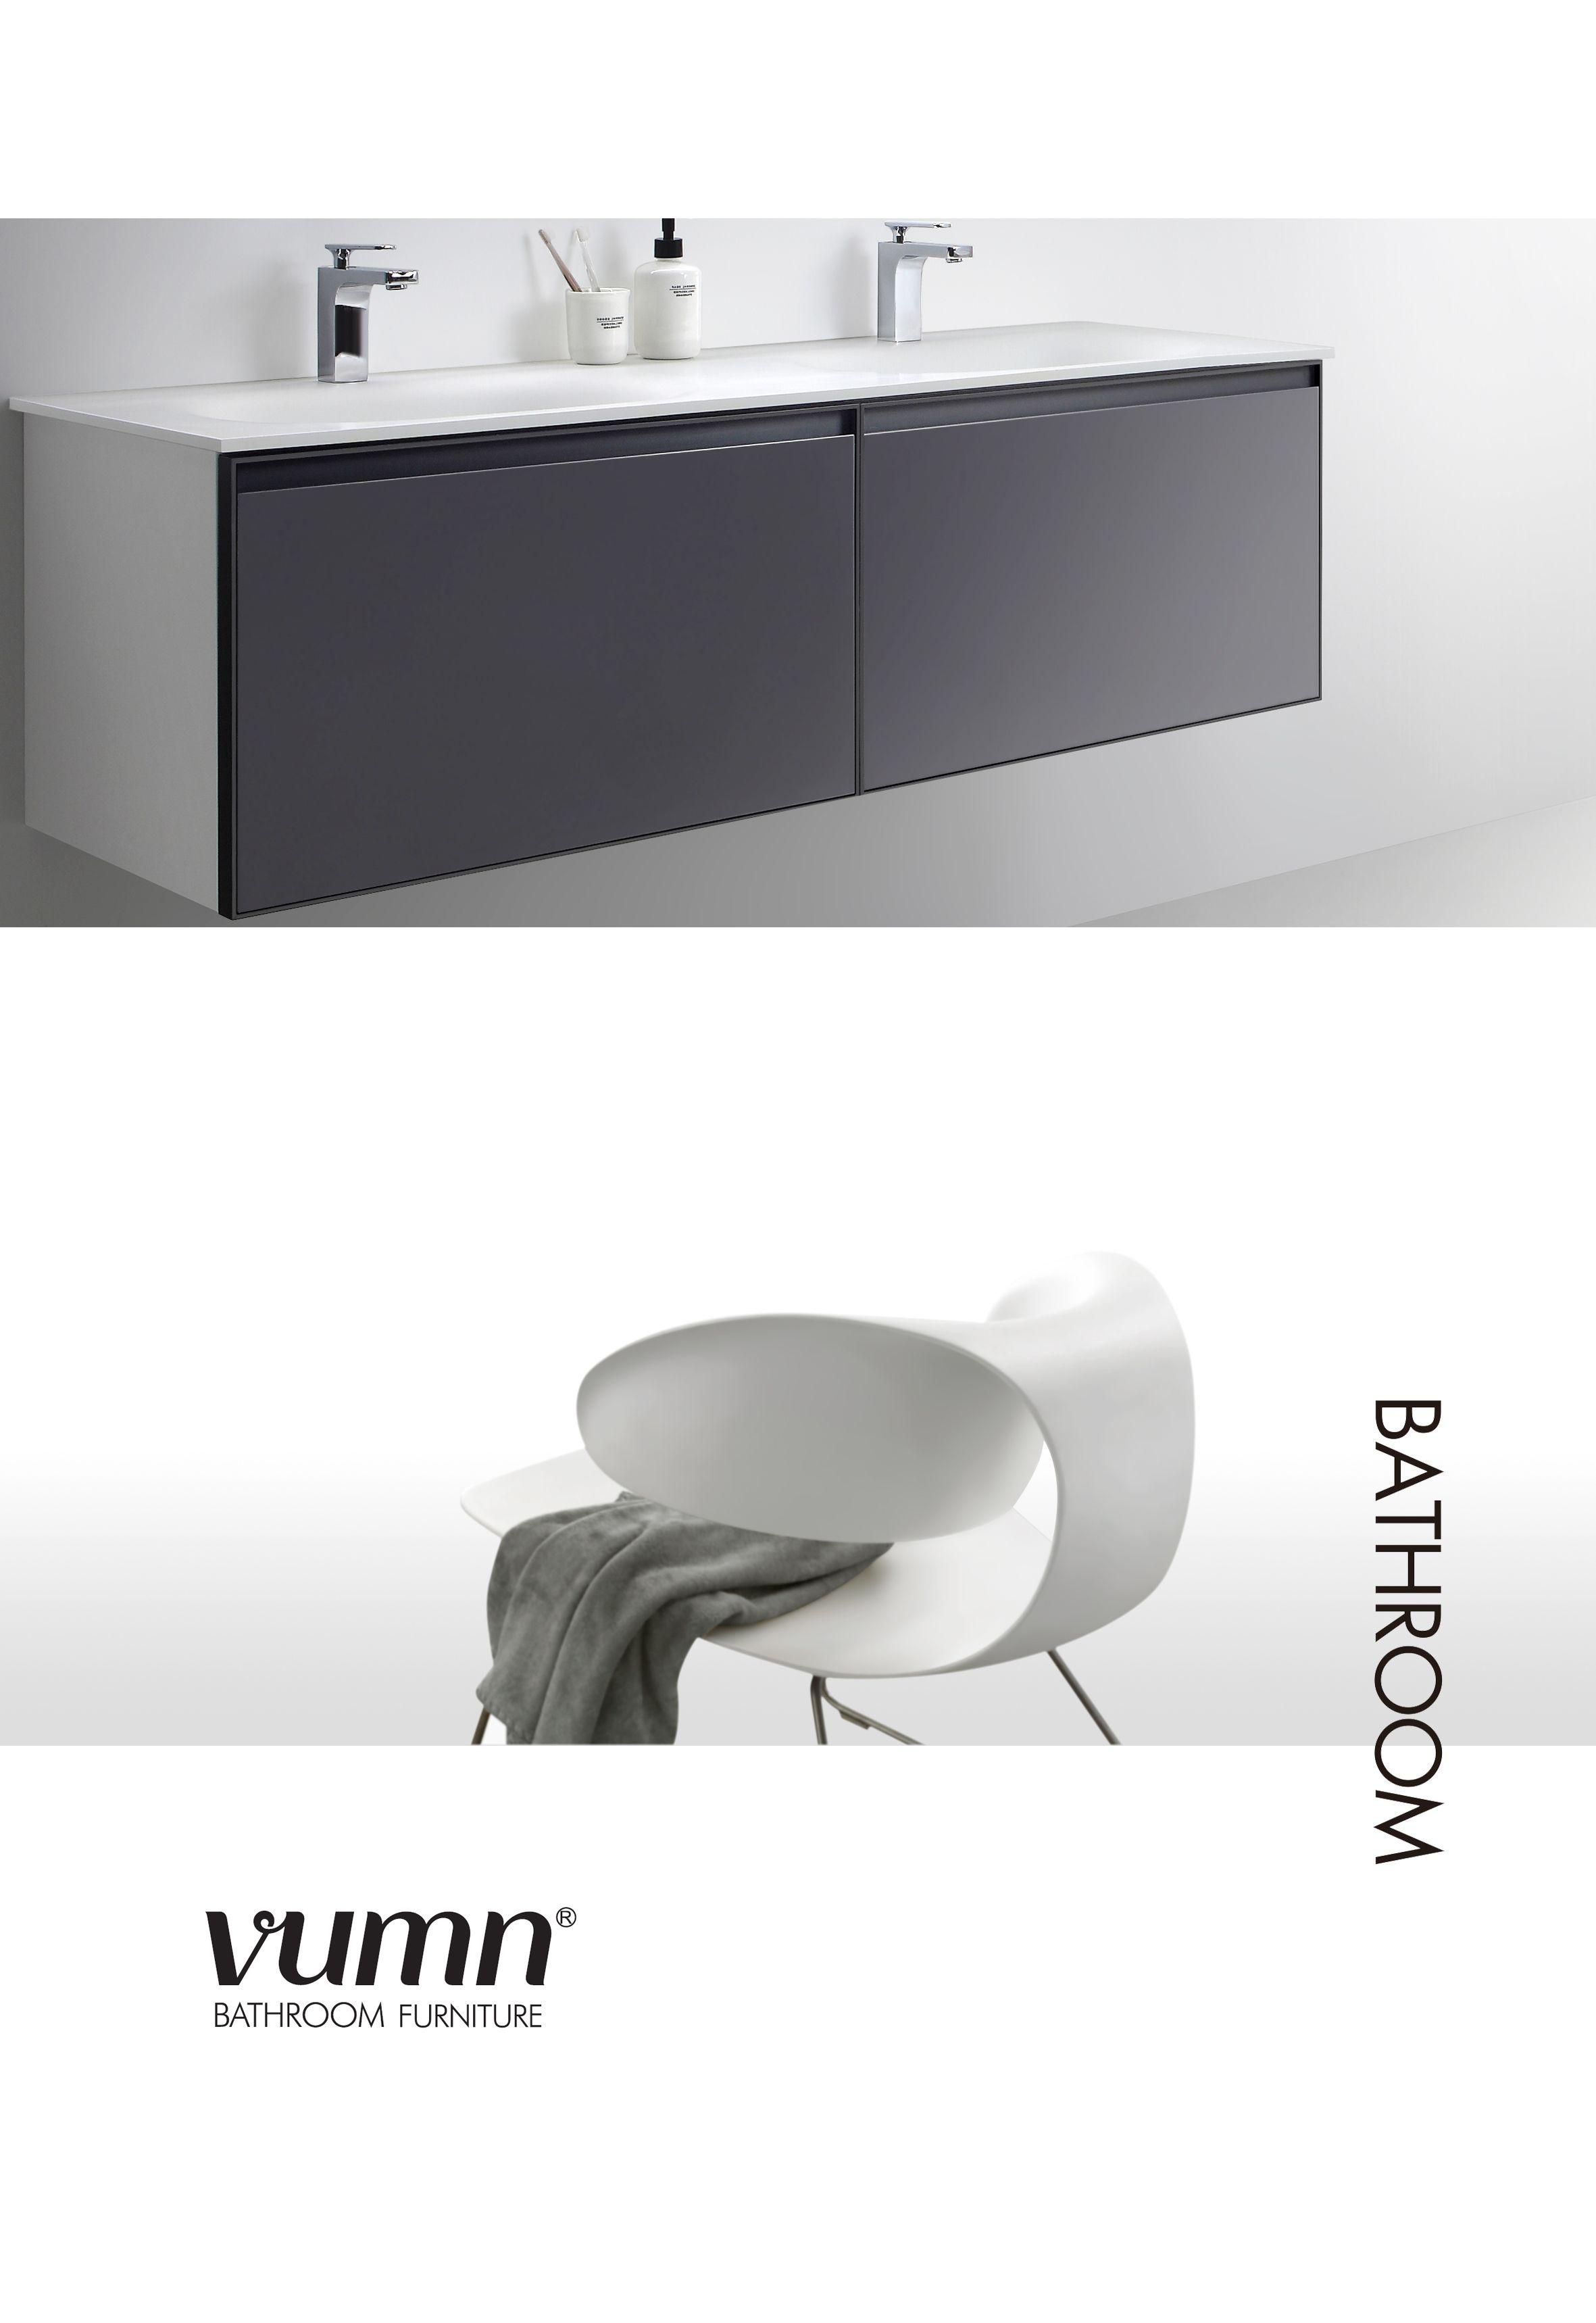 Modern Matt Grey Bathroom Cabinets Tags Apartment Living Room Decorating Ideas On A Budget Furniture Www Vumn Cc